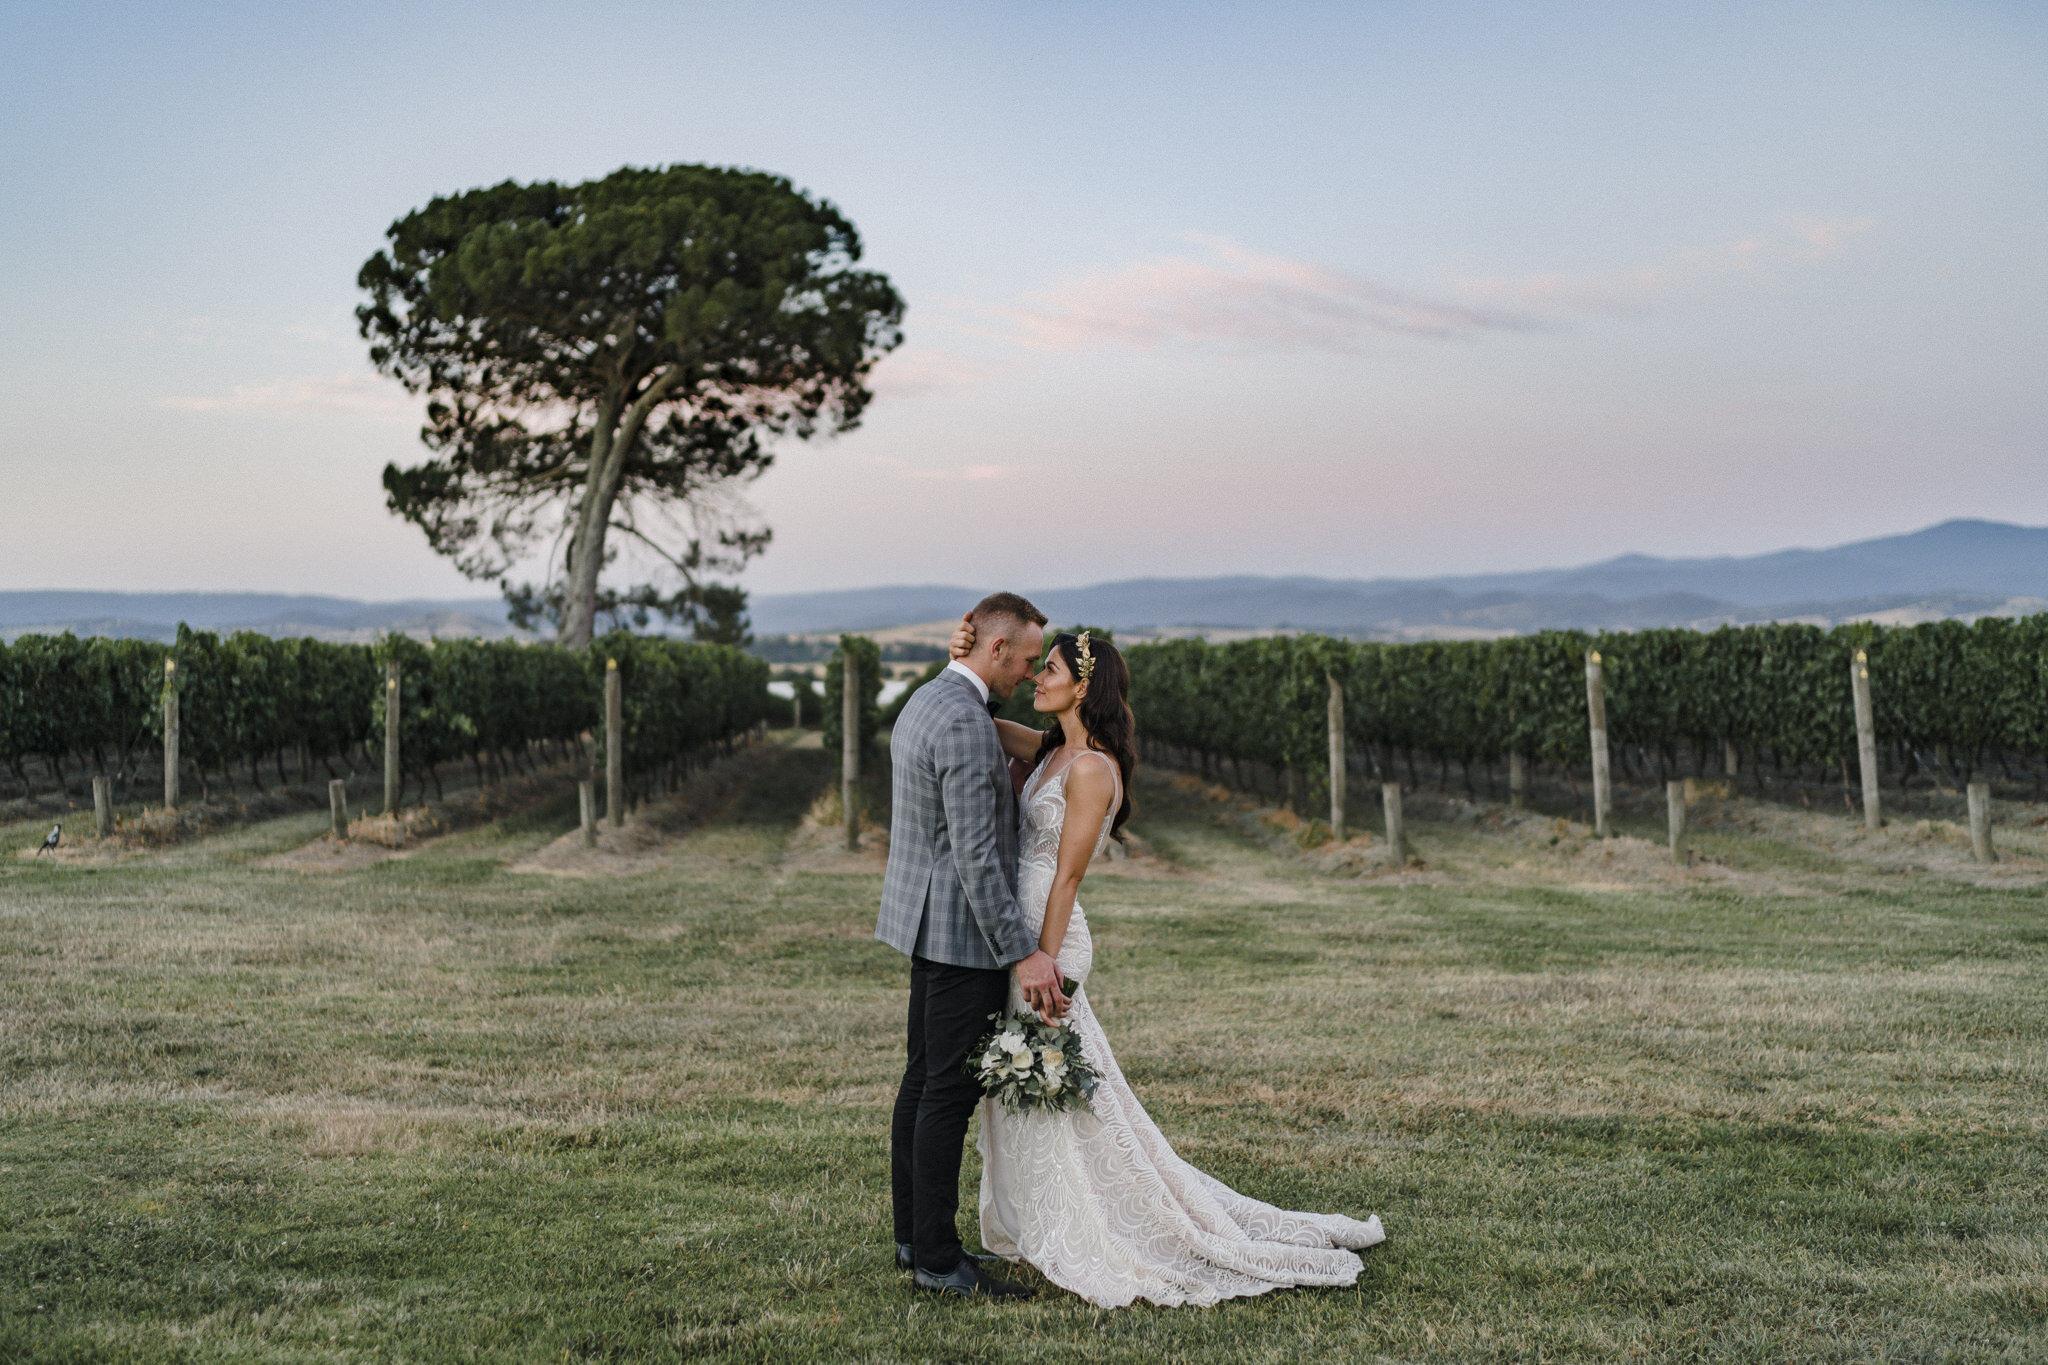 Corey Wright Stones Yarra Valley Wedding Photography_002